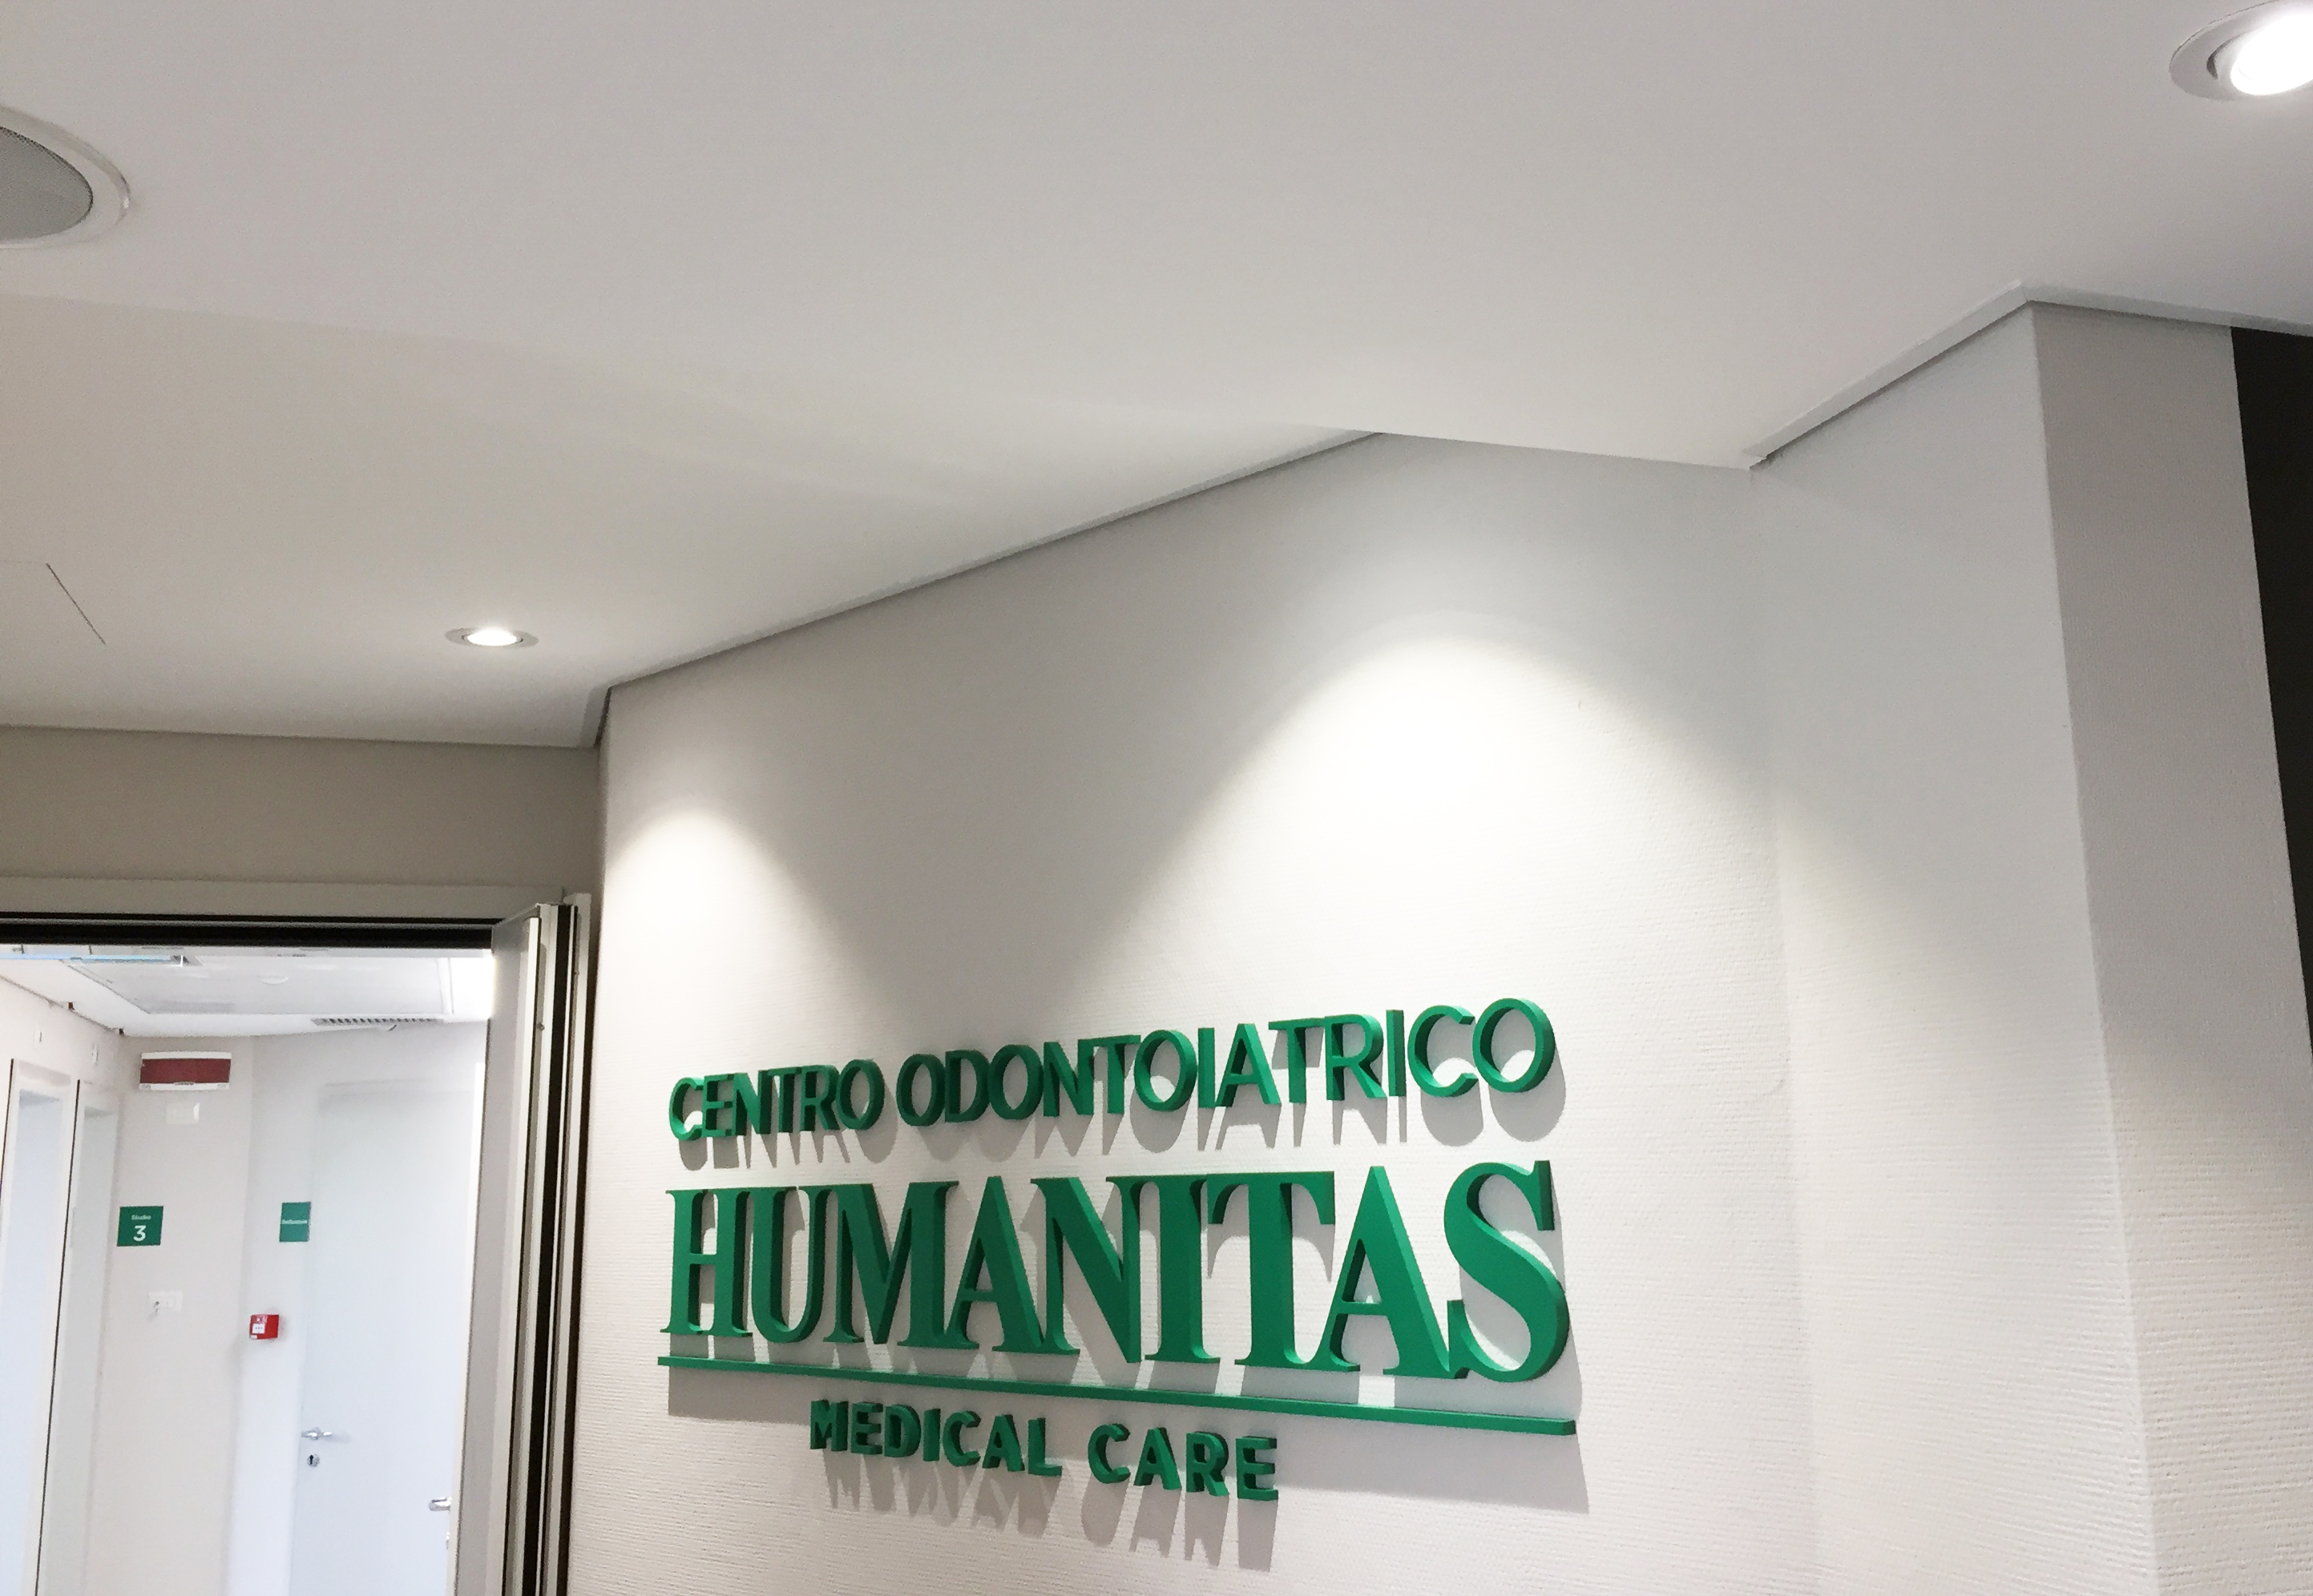 Odontoiatria Humanitas Medical Care